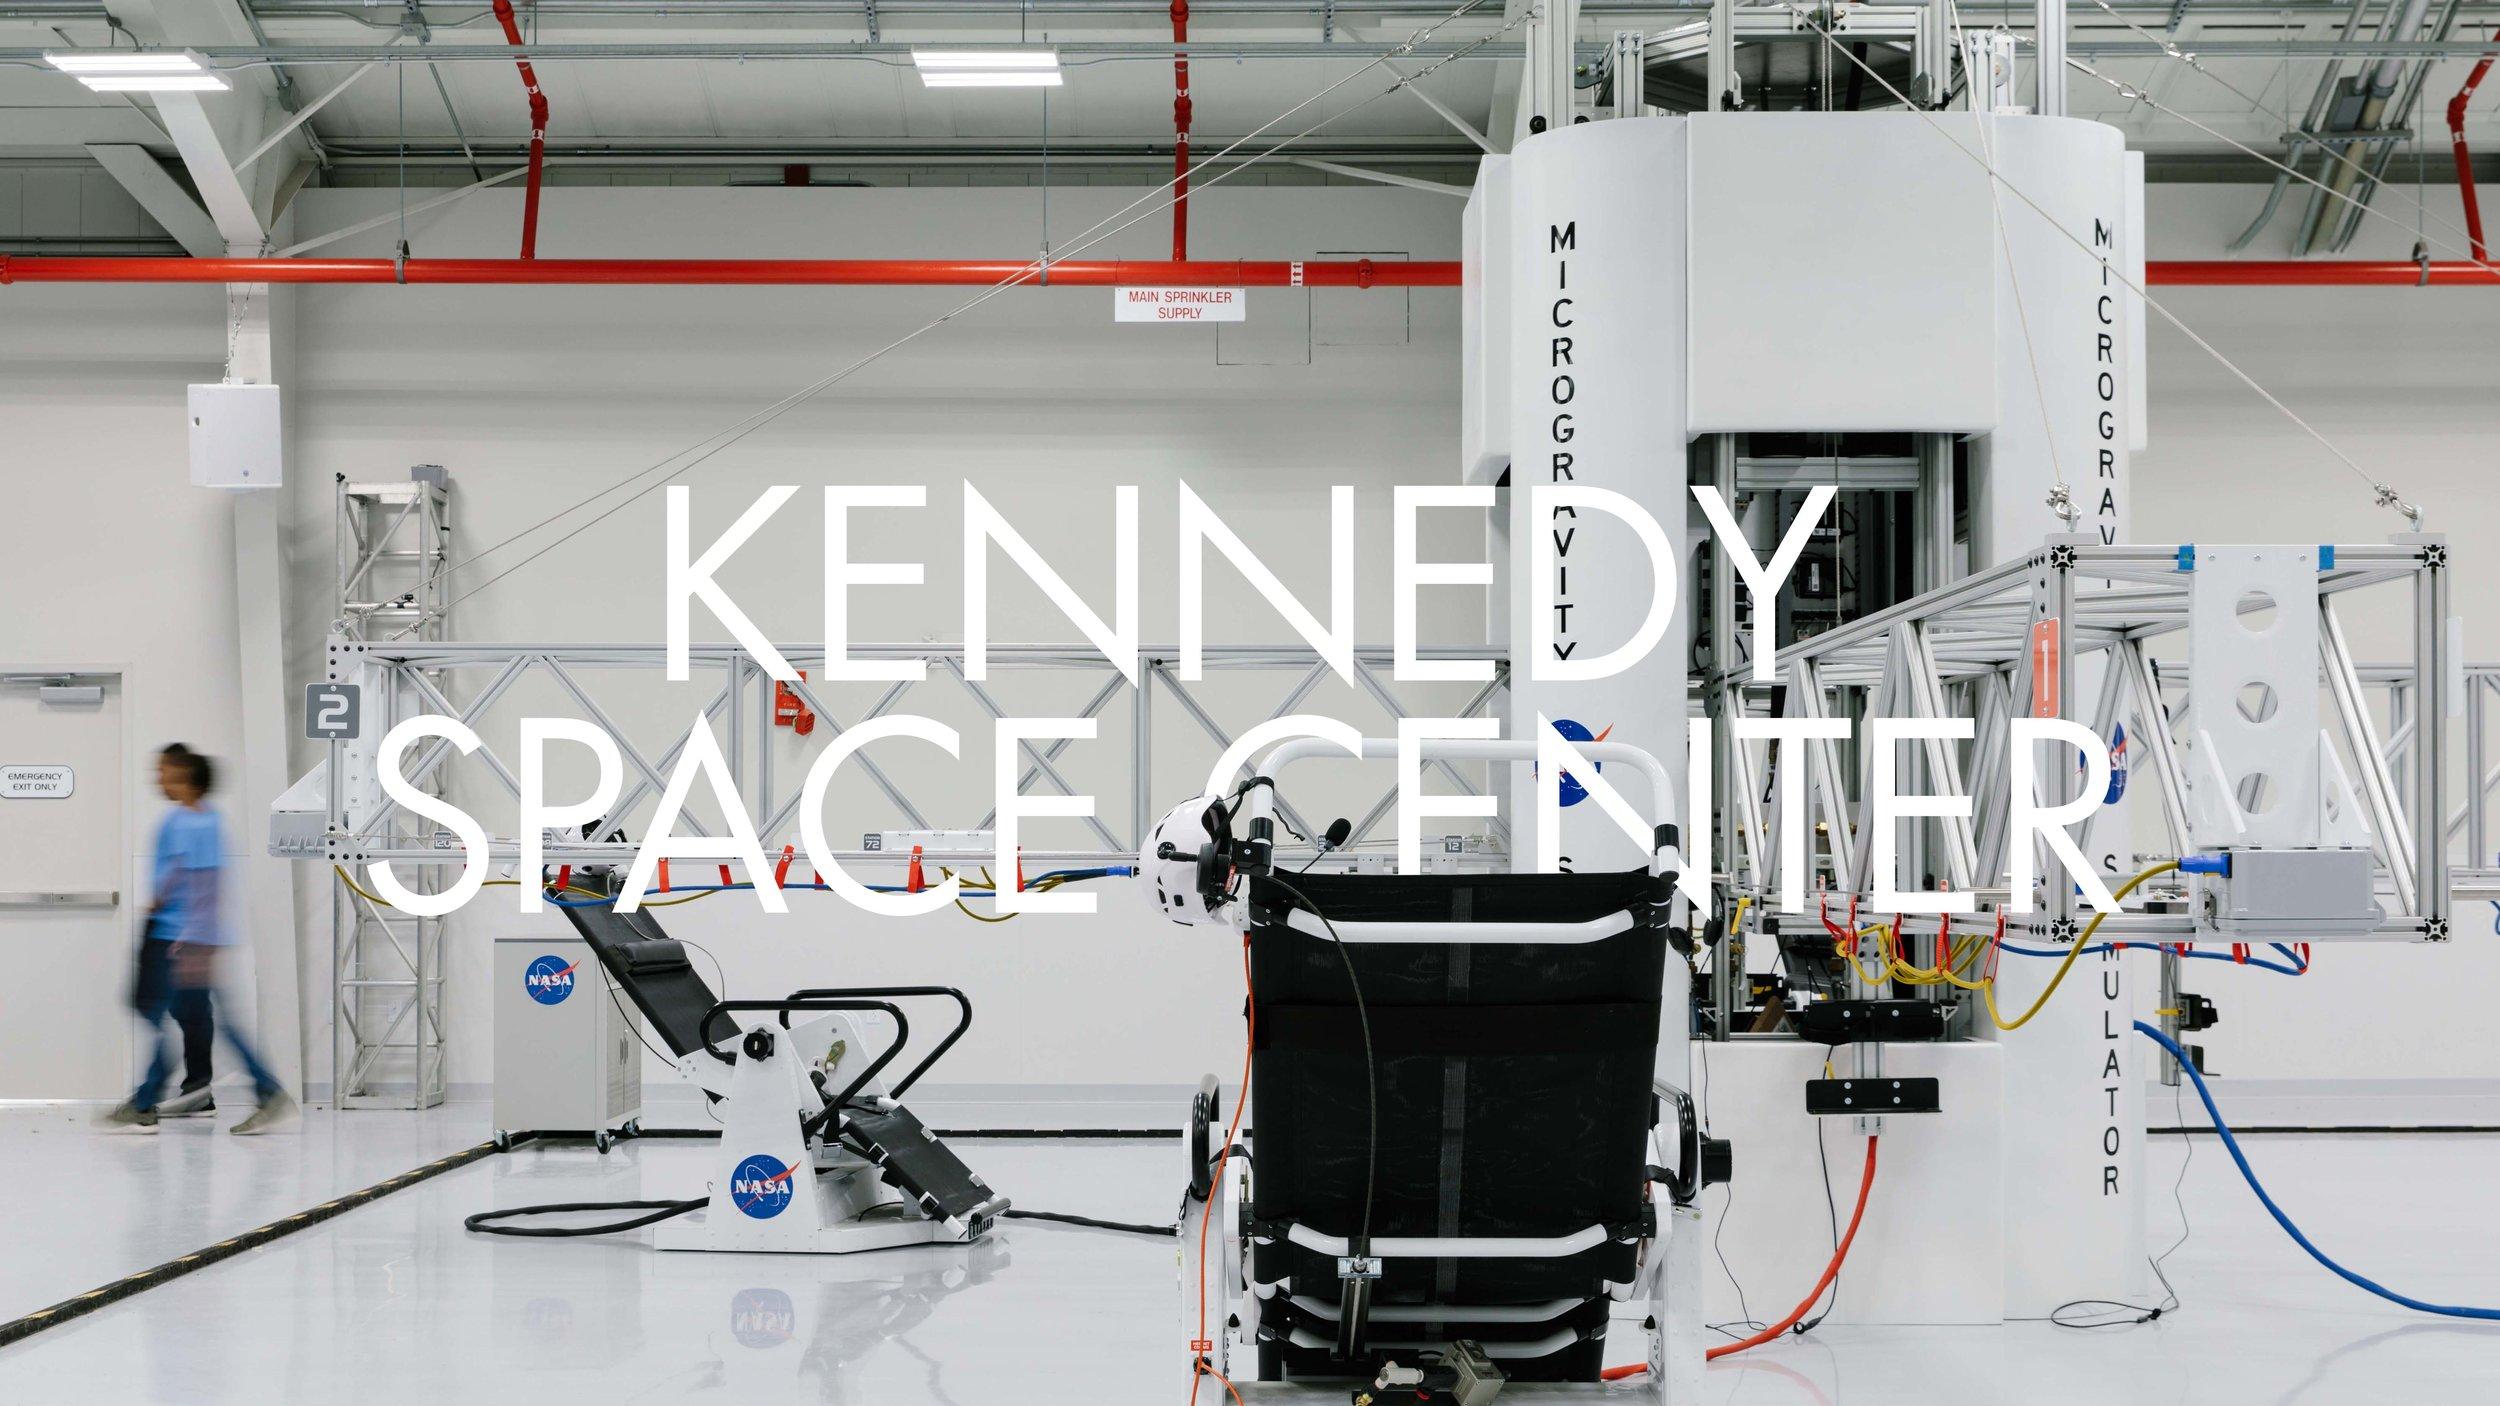 Kennedy Space Center.jpg